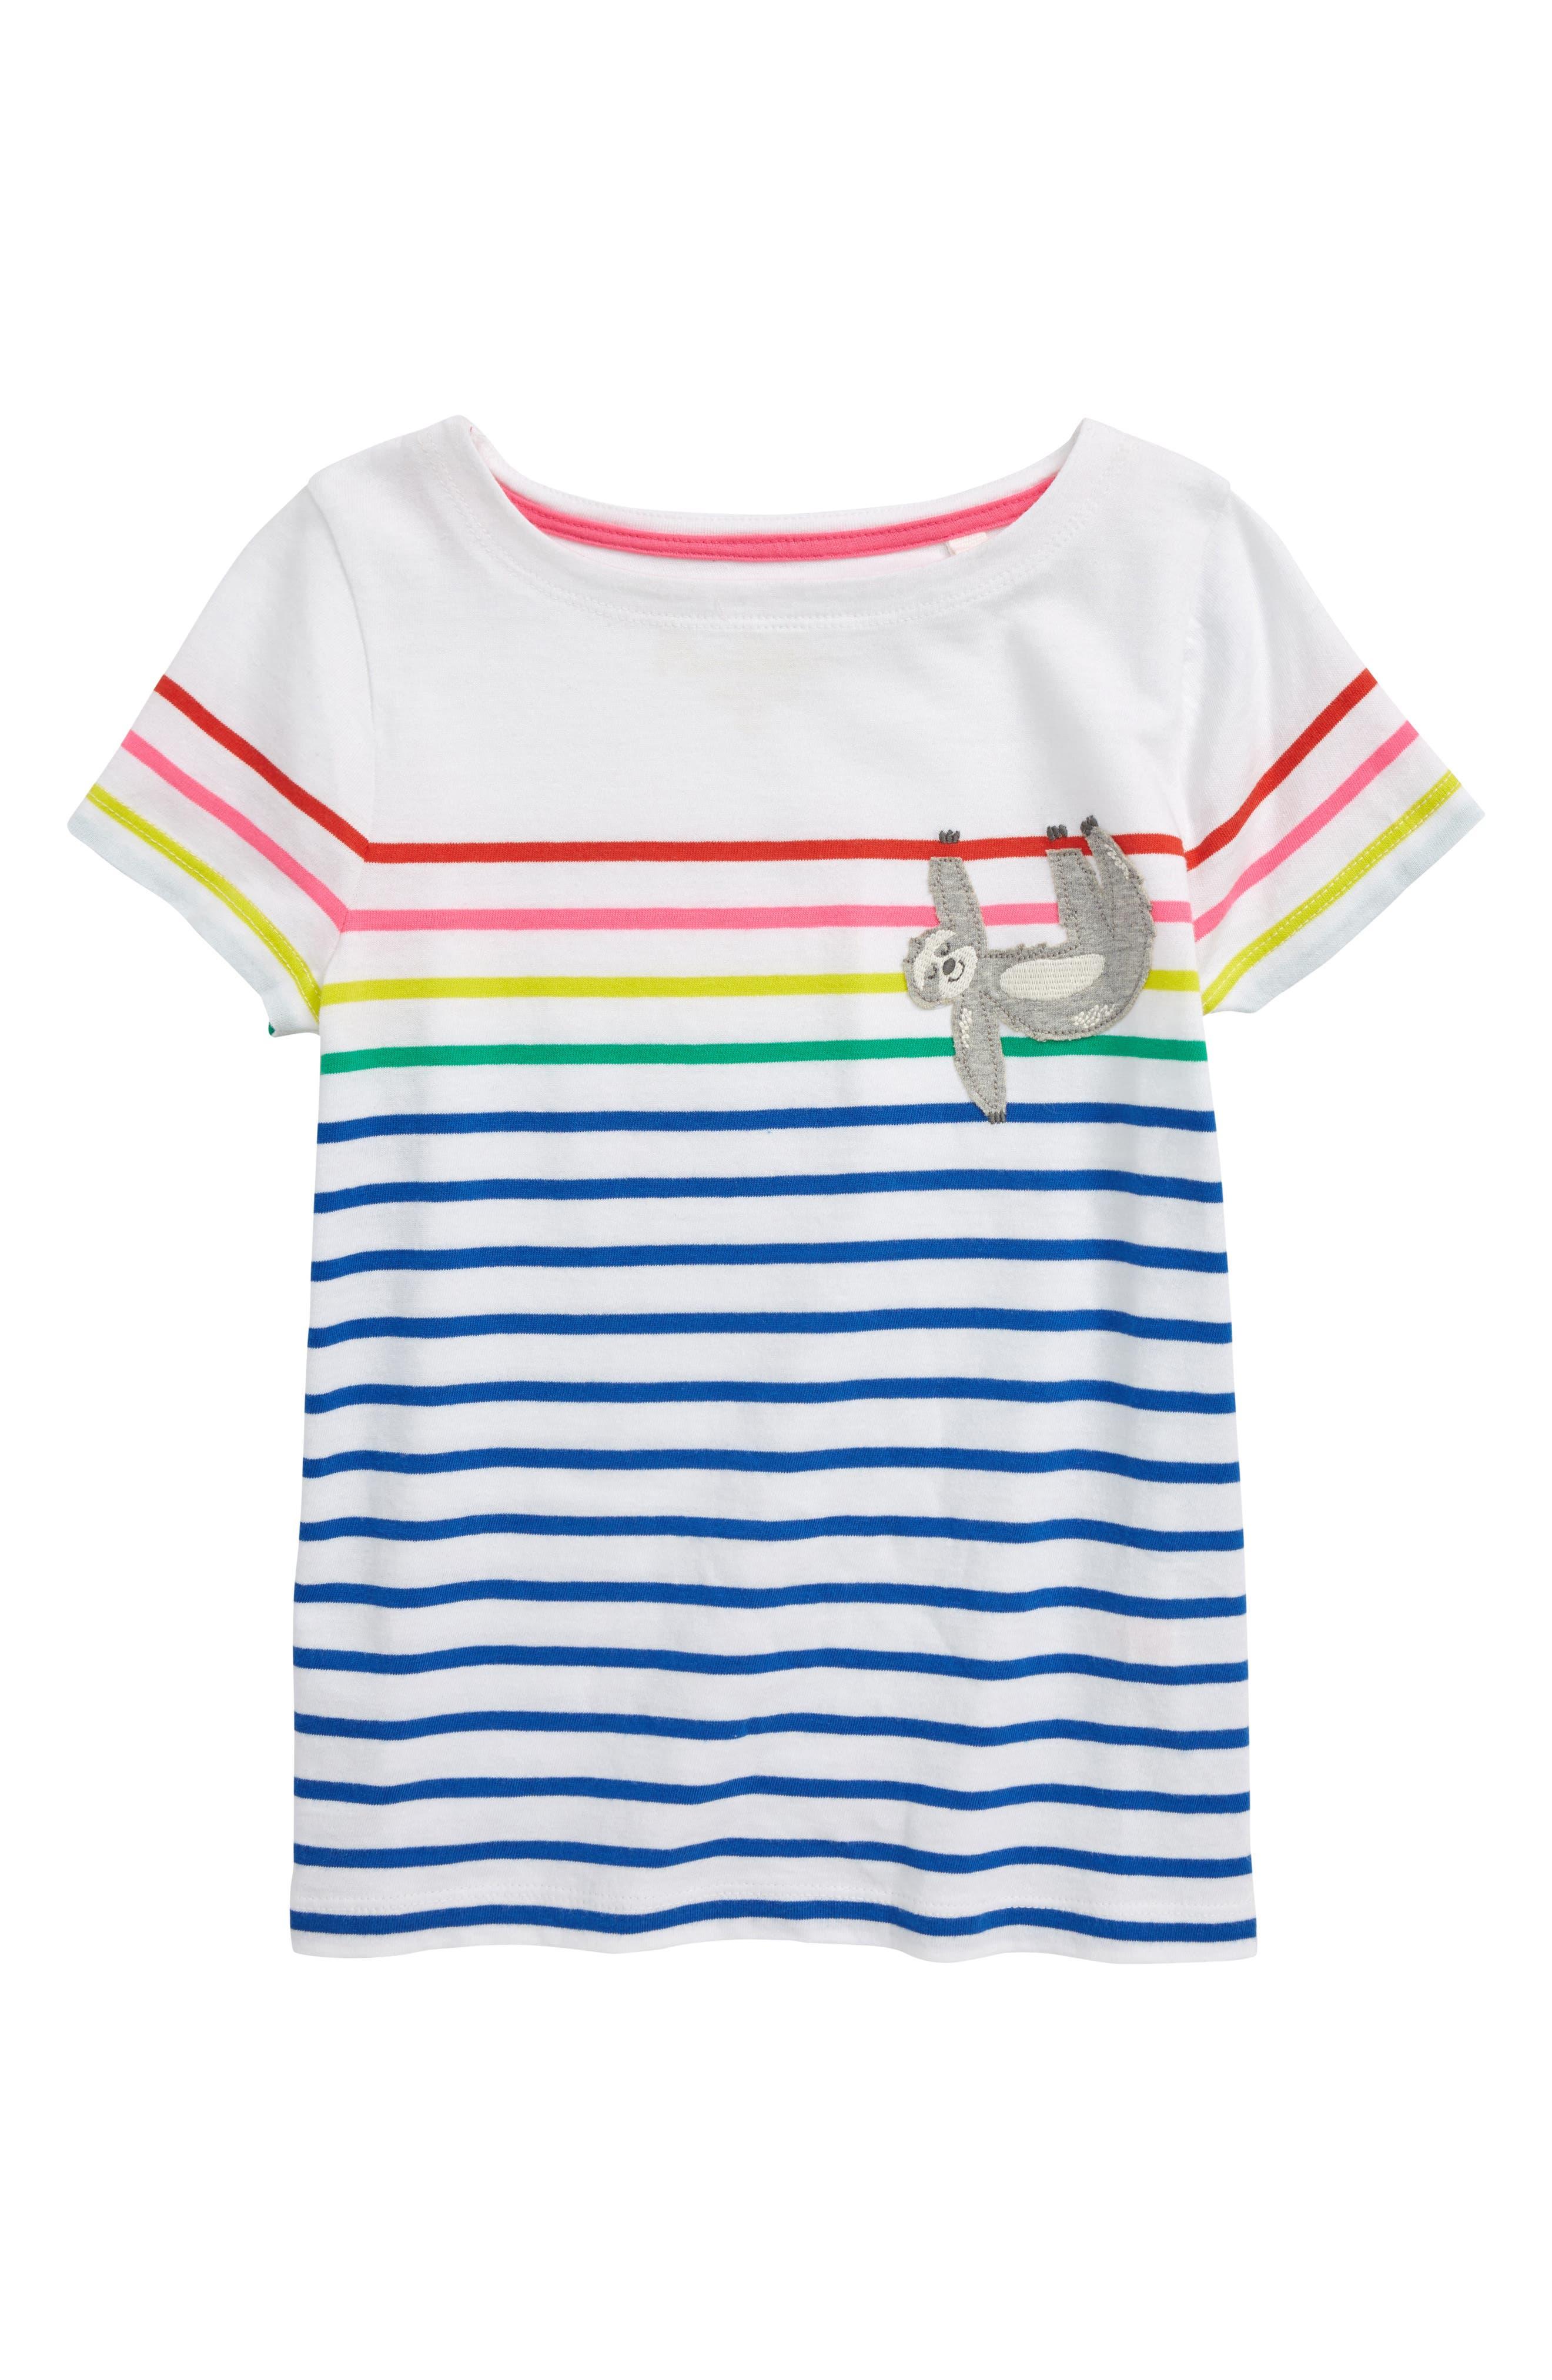 Breton Stripe Tee, Main, color, BLU DUKE BLUE/ RAINBOW SLOTH